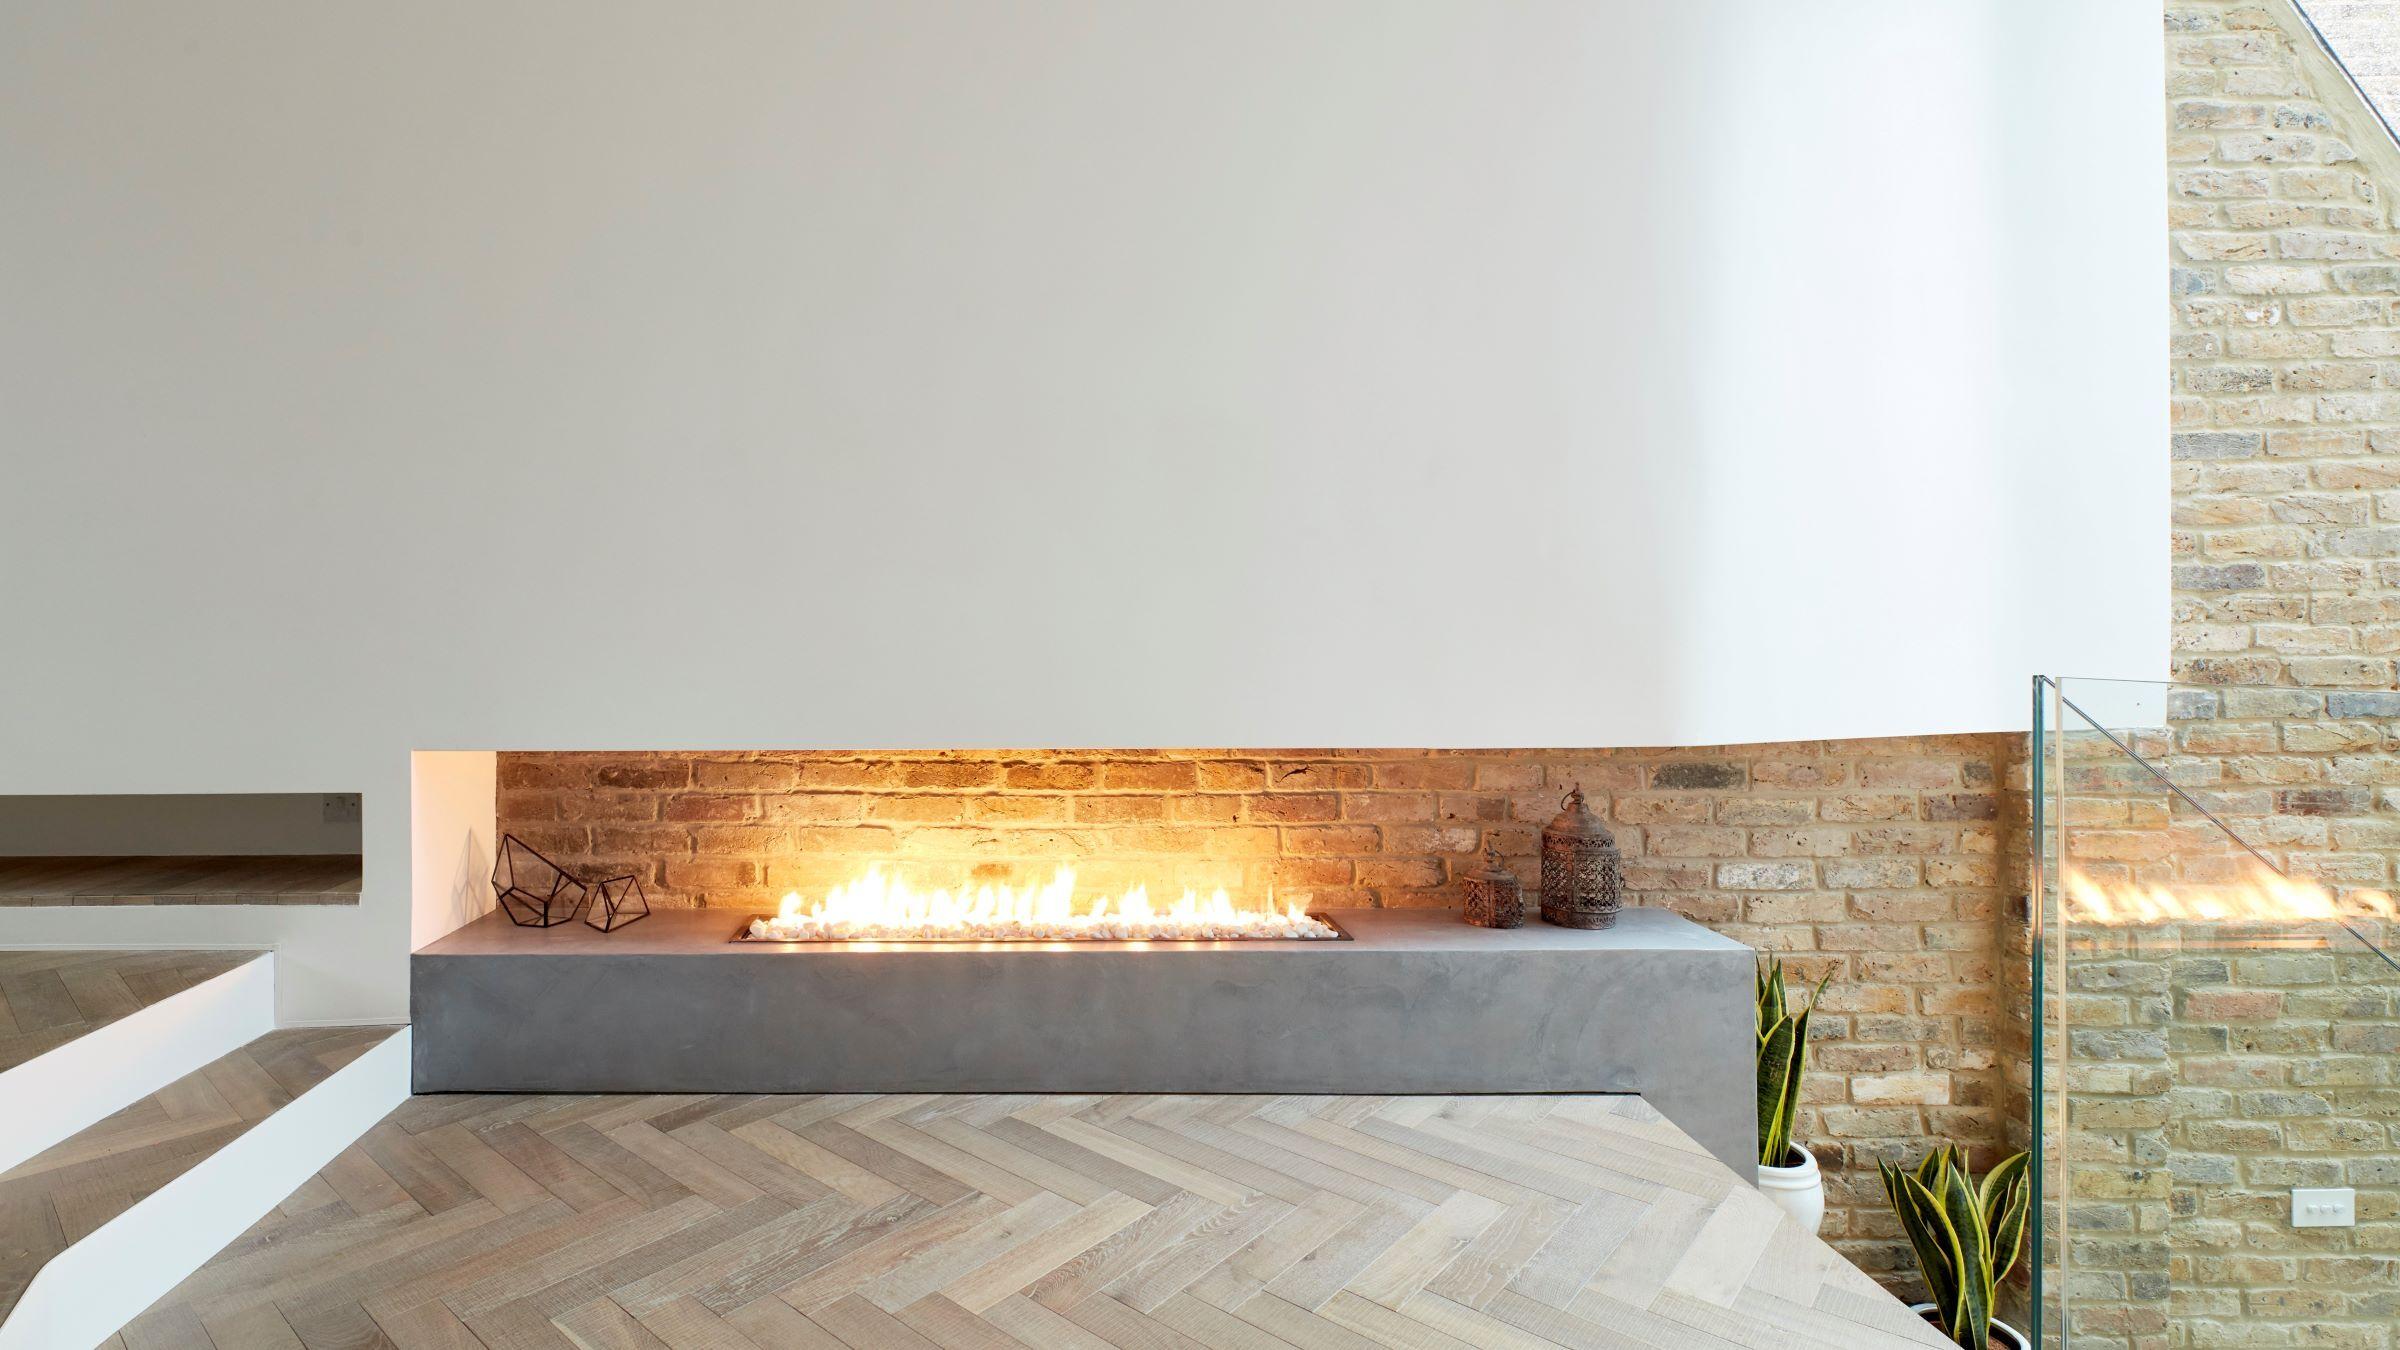 Oak Tate Bute herringbone floor scenario architects Hackney home with fireplace